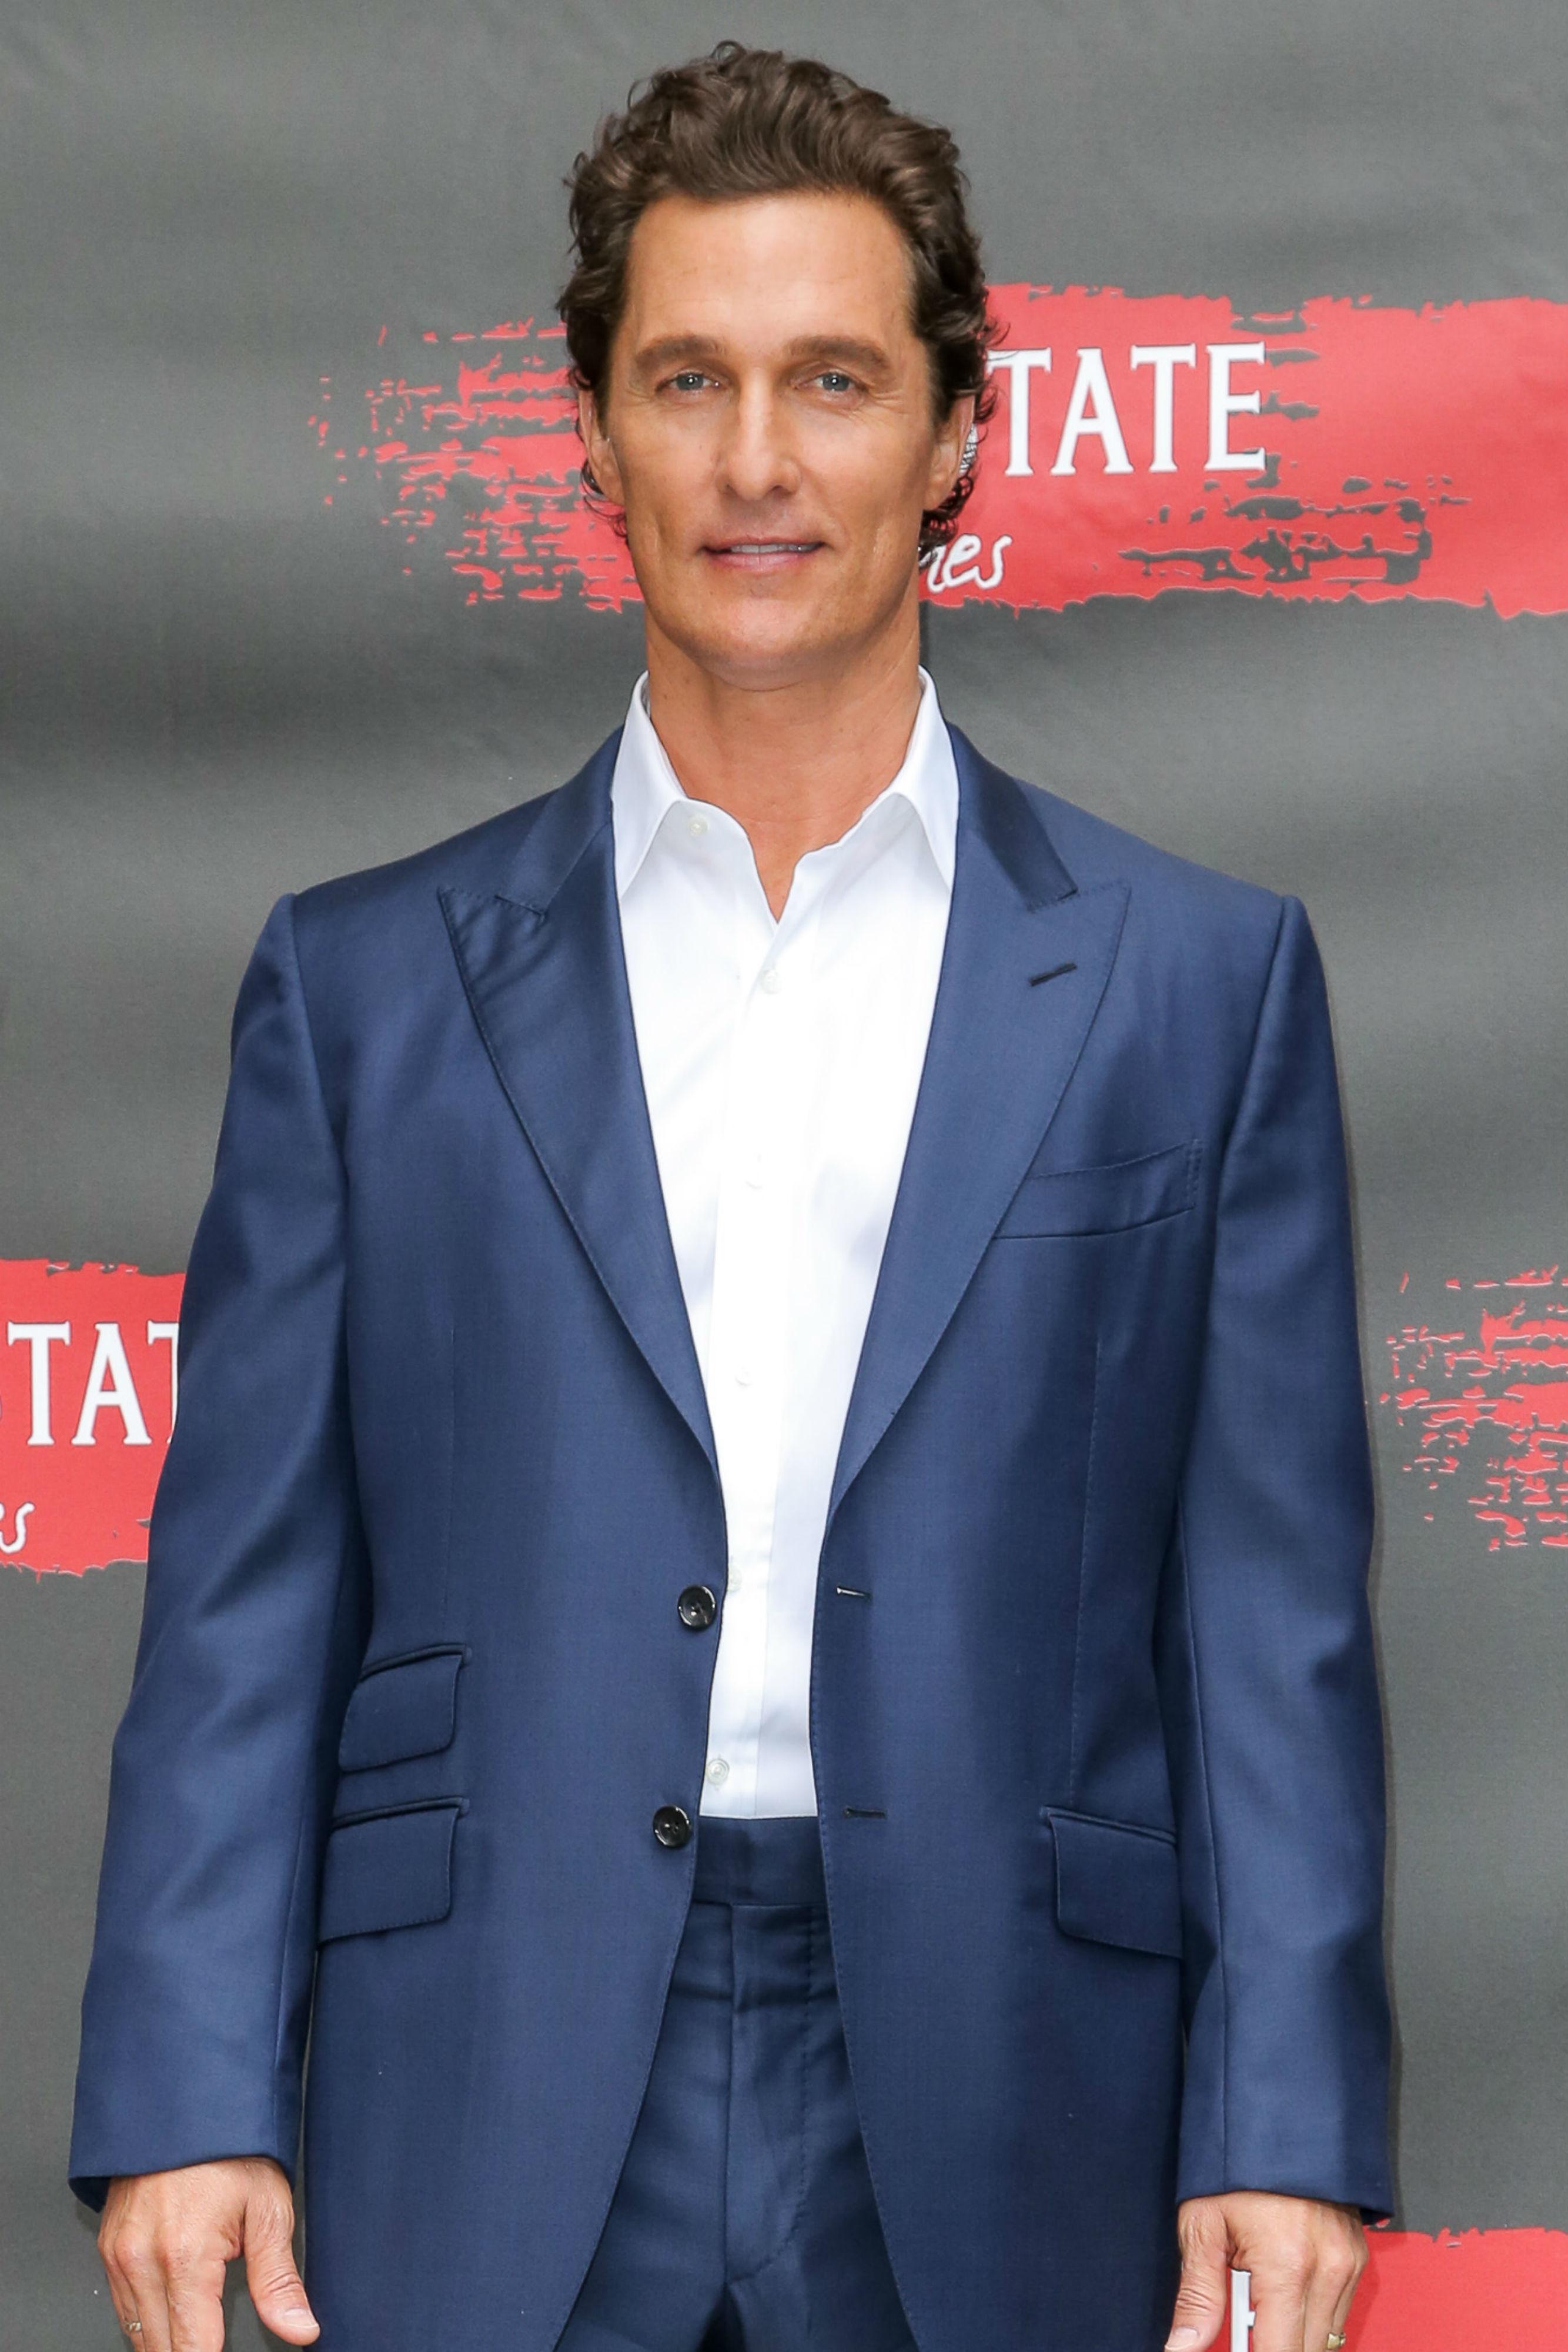 Season 3: Matthew McConaughey